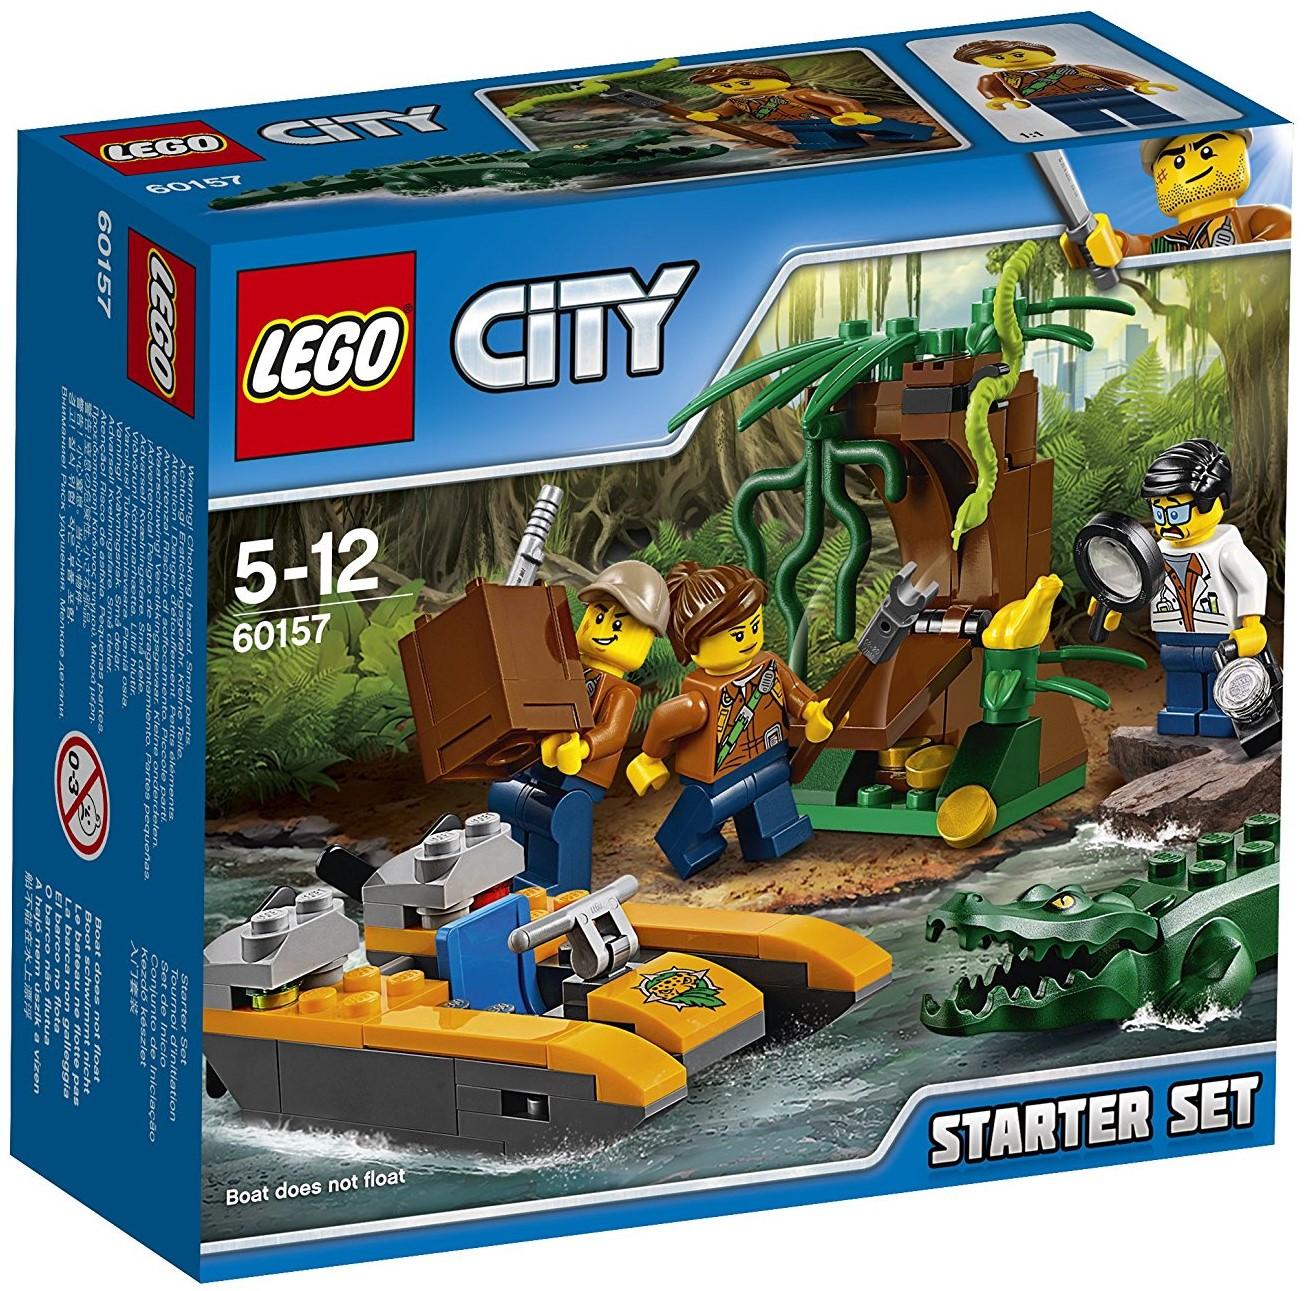 LEGO CITY NEW Scientist Female /& Male Explorer 60157 Minifigure Jungle Starter